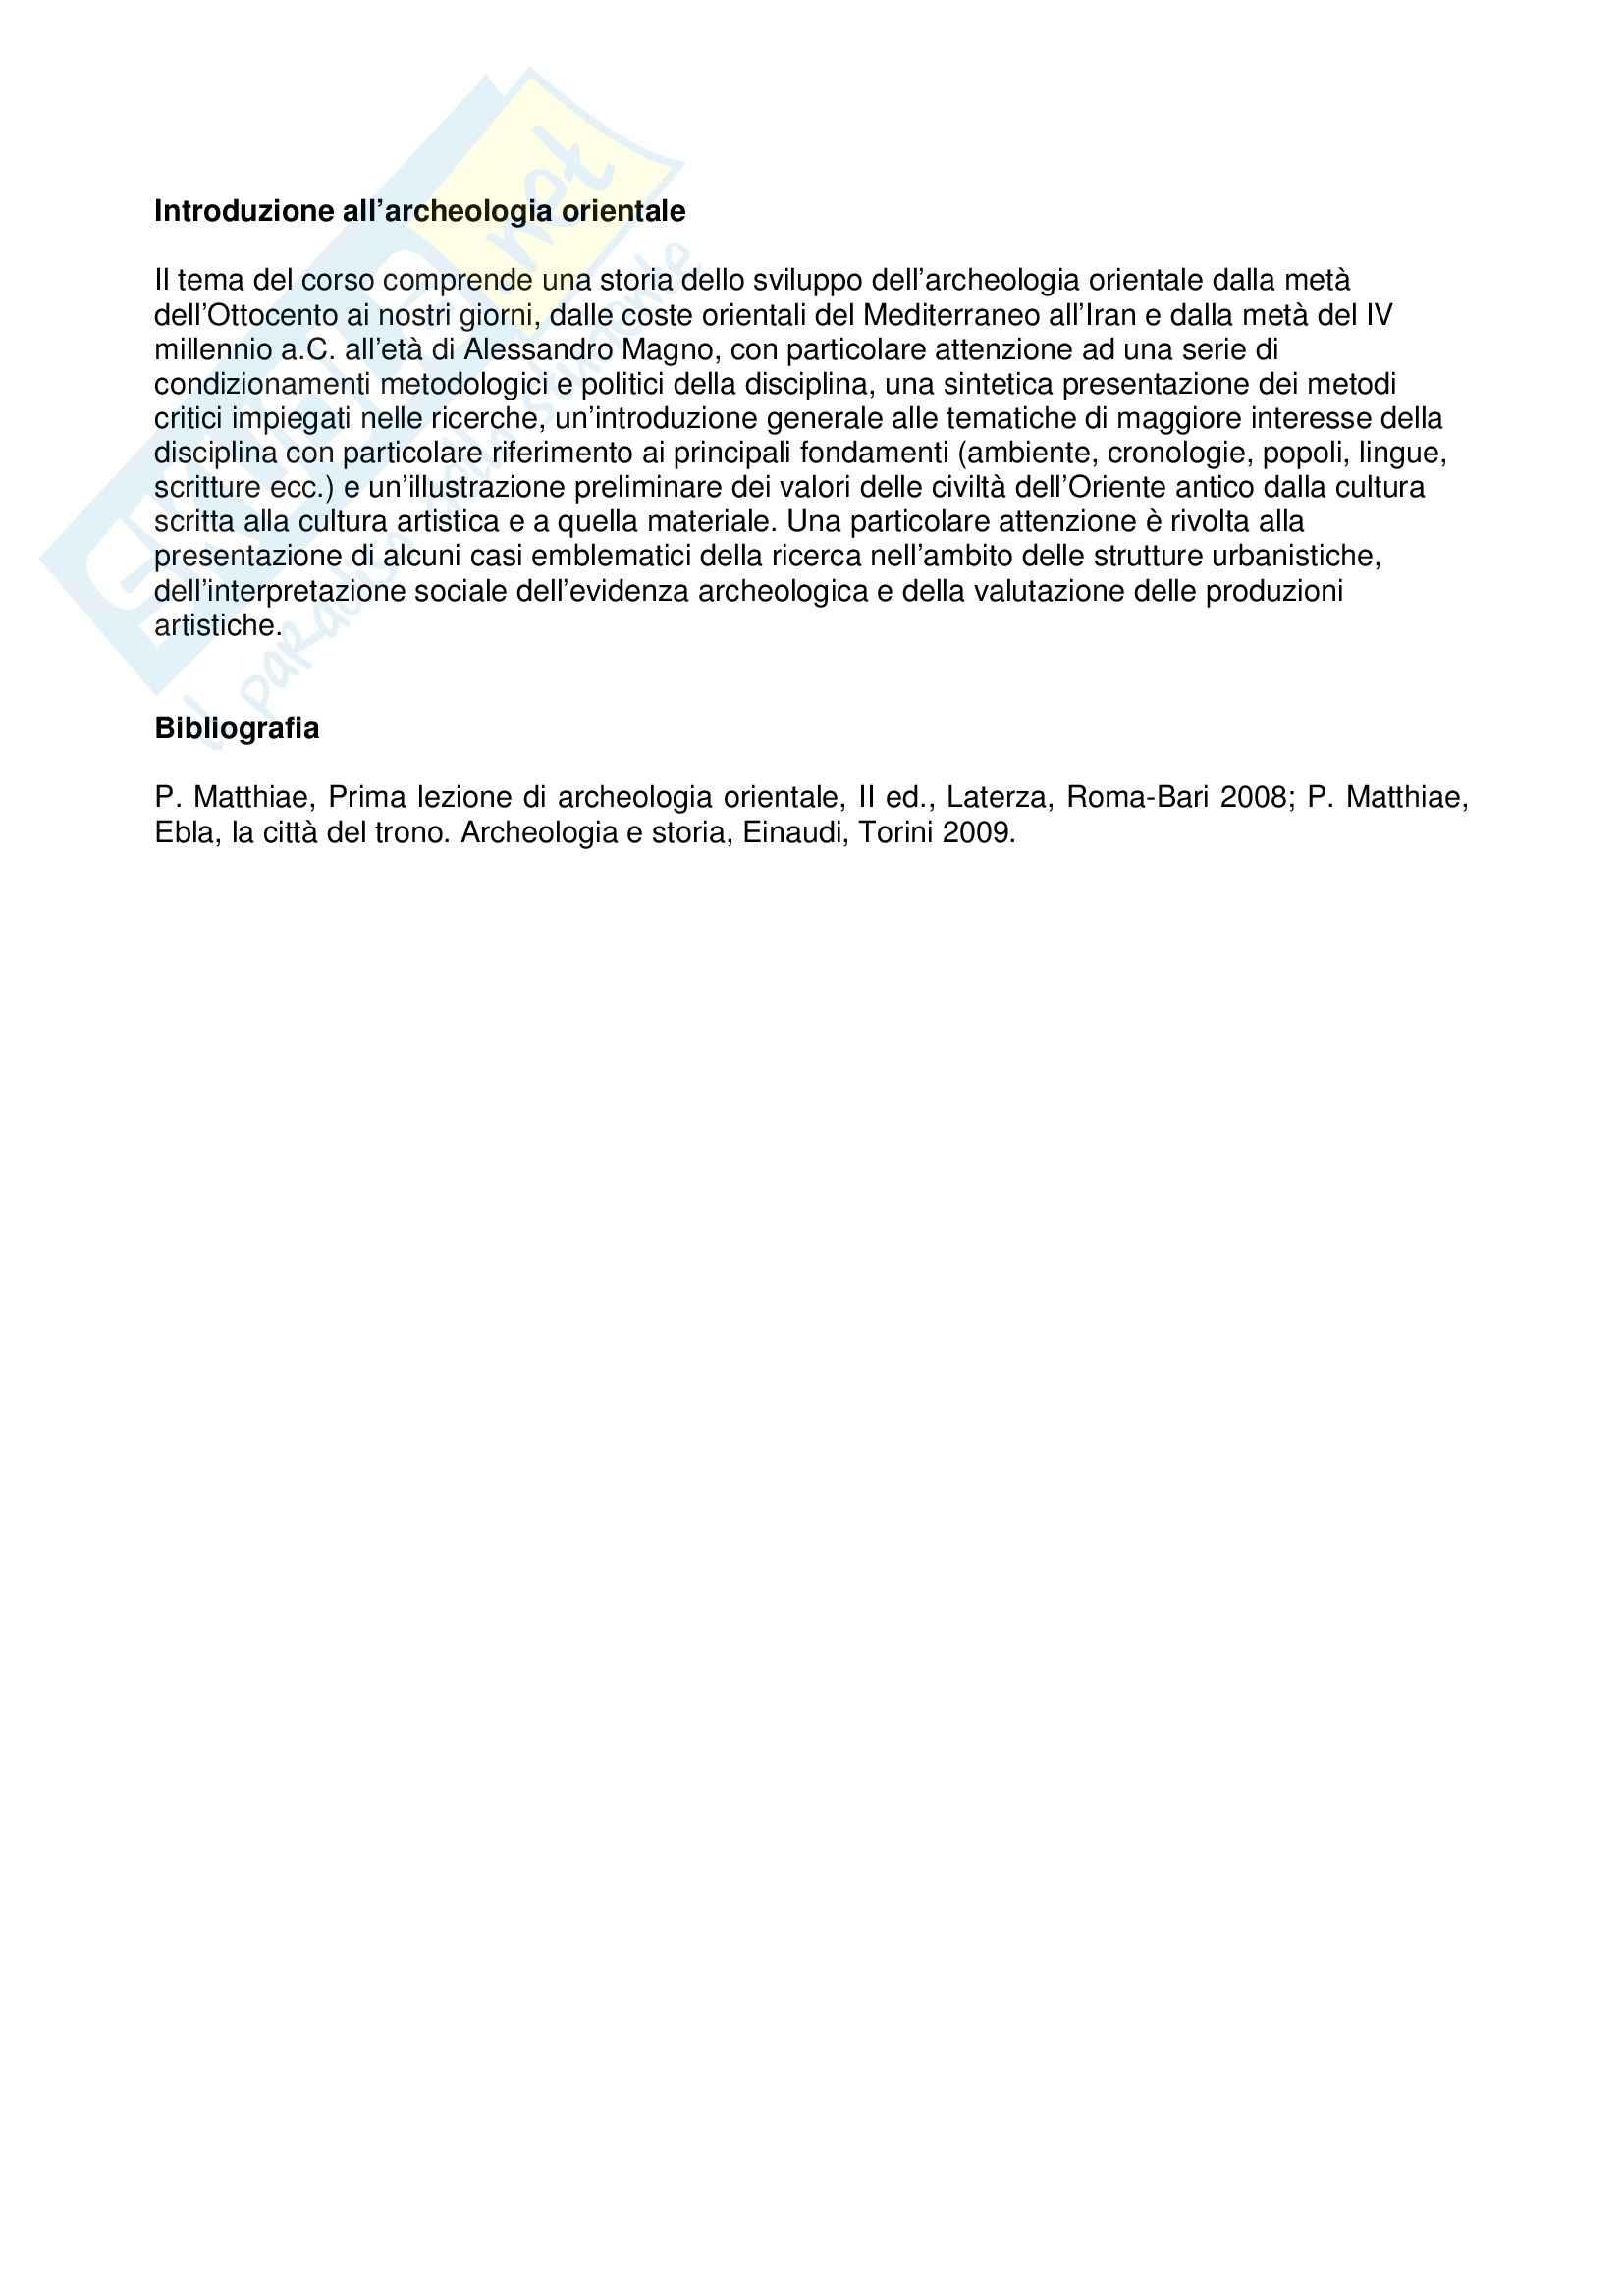 Archeologia orientale - Introduzione